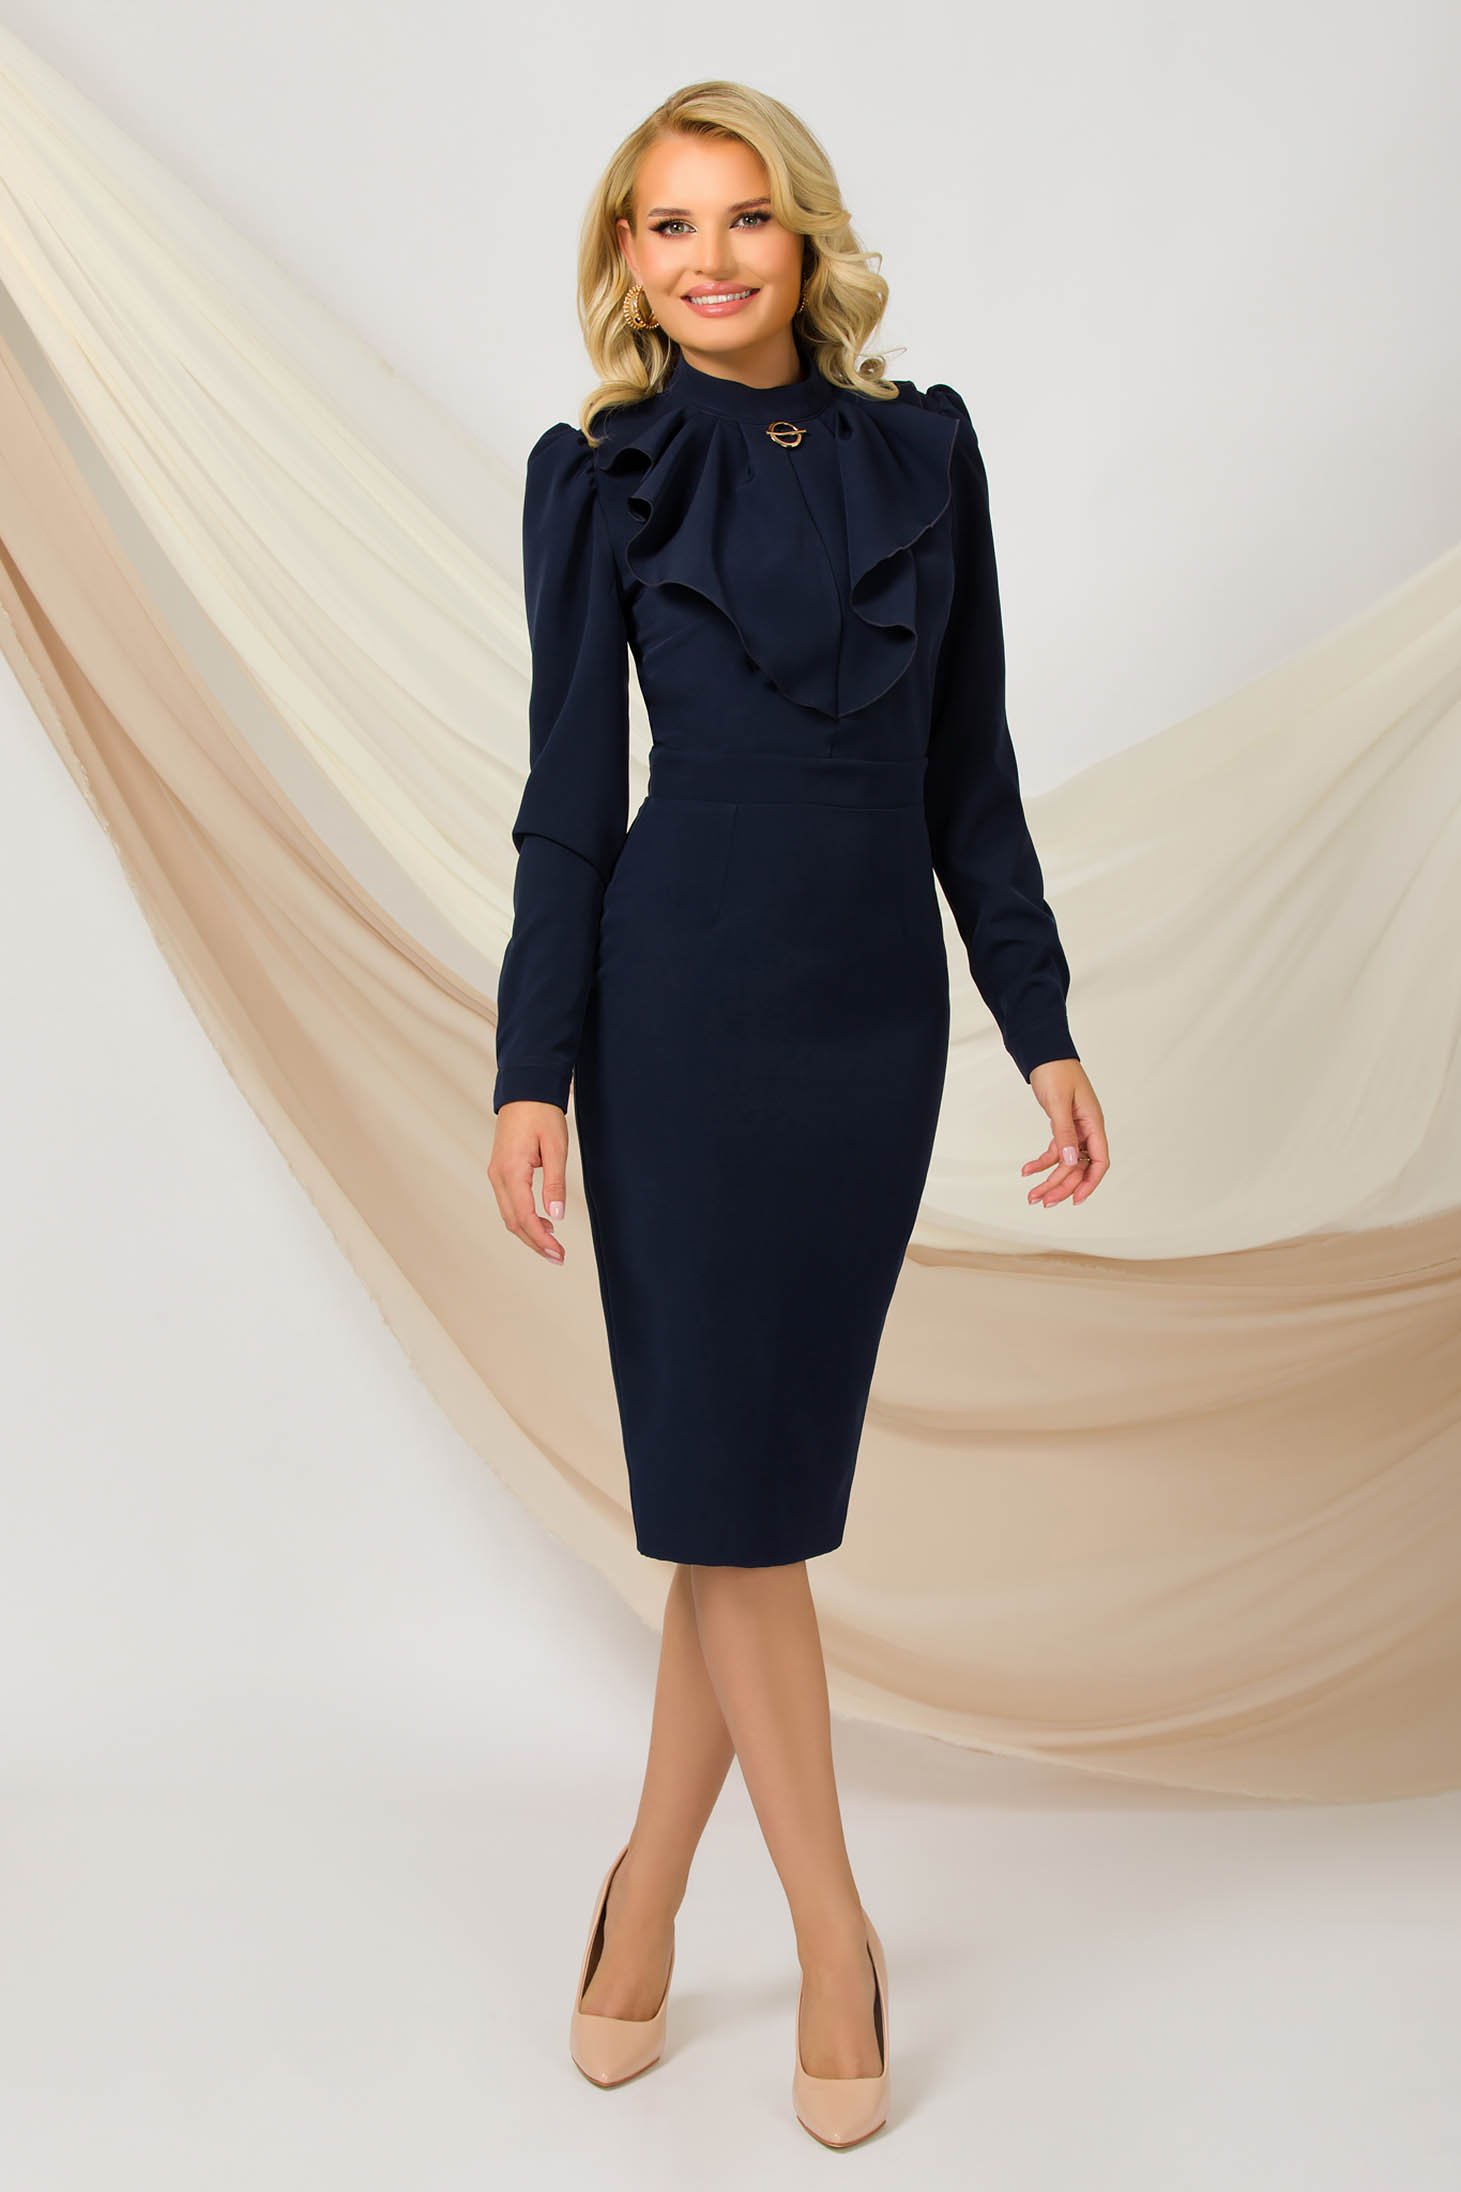 Darkblue dress midi pencil thin fabric office slightly elastic fabric accessorized with breastpin